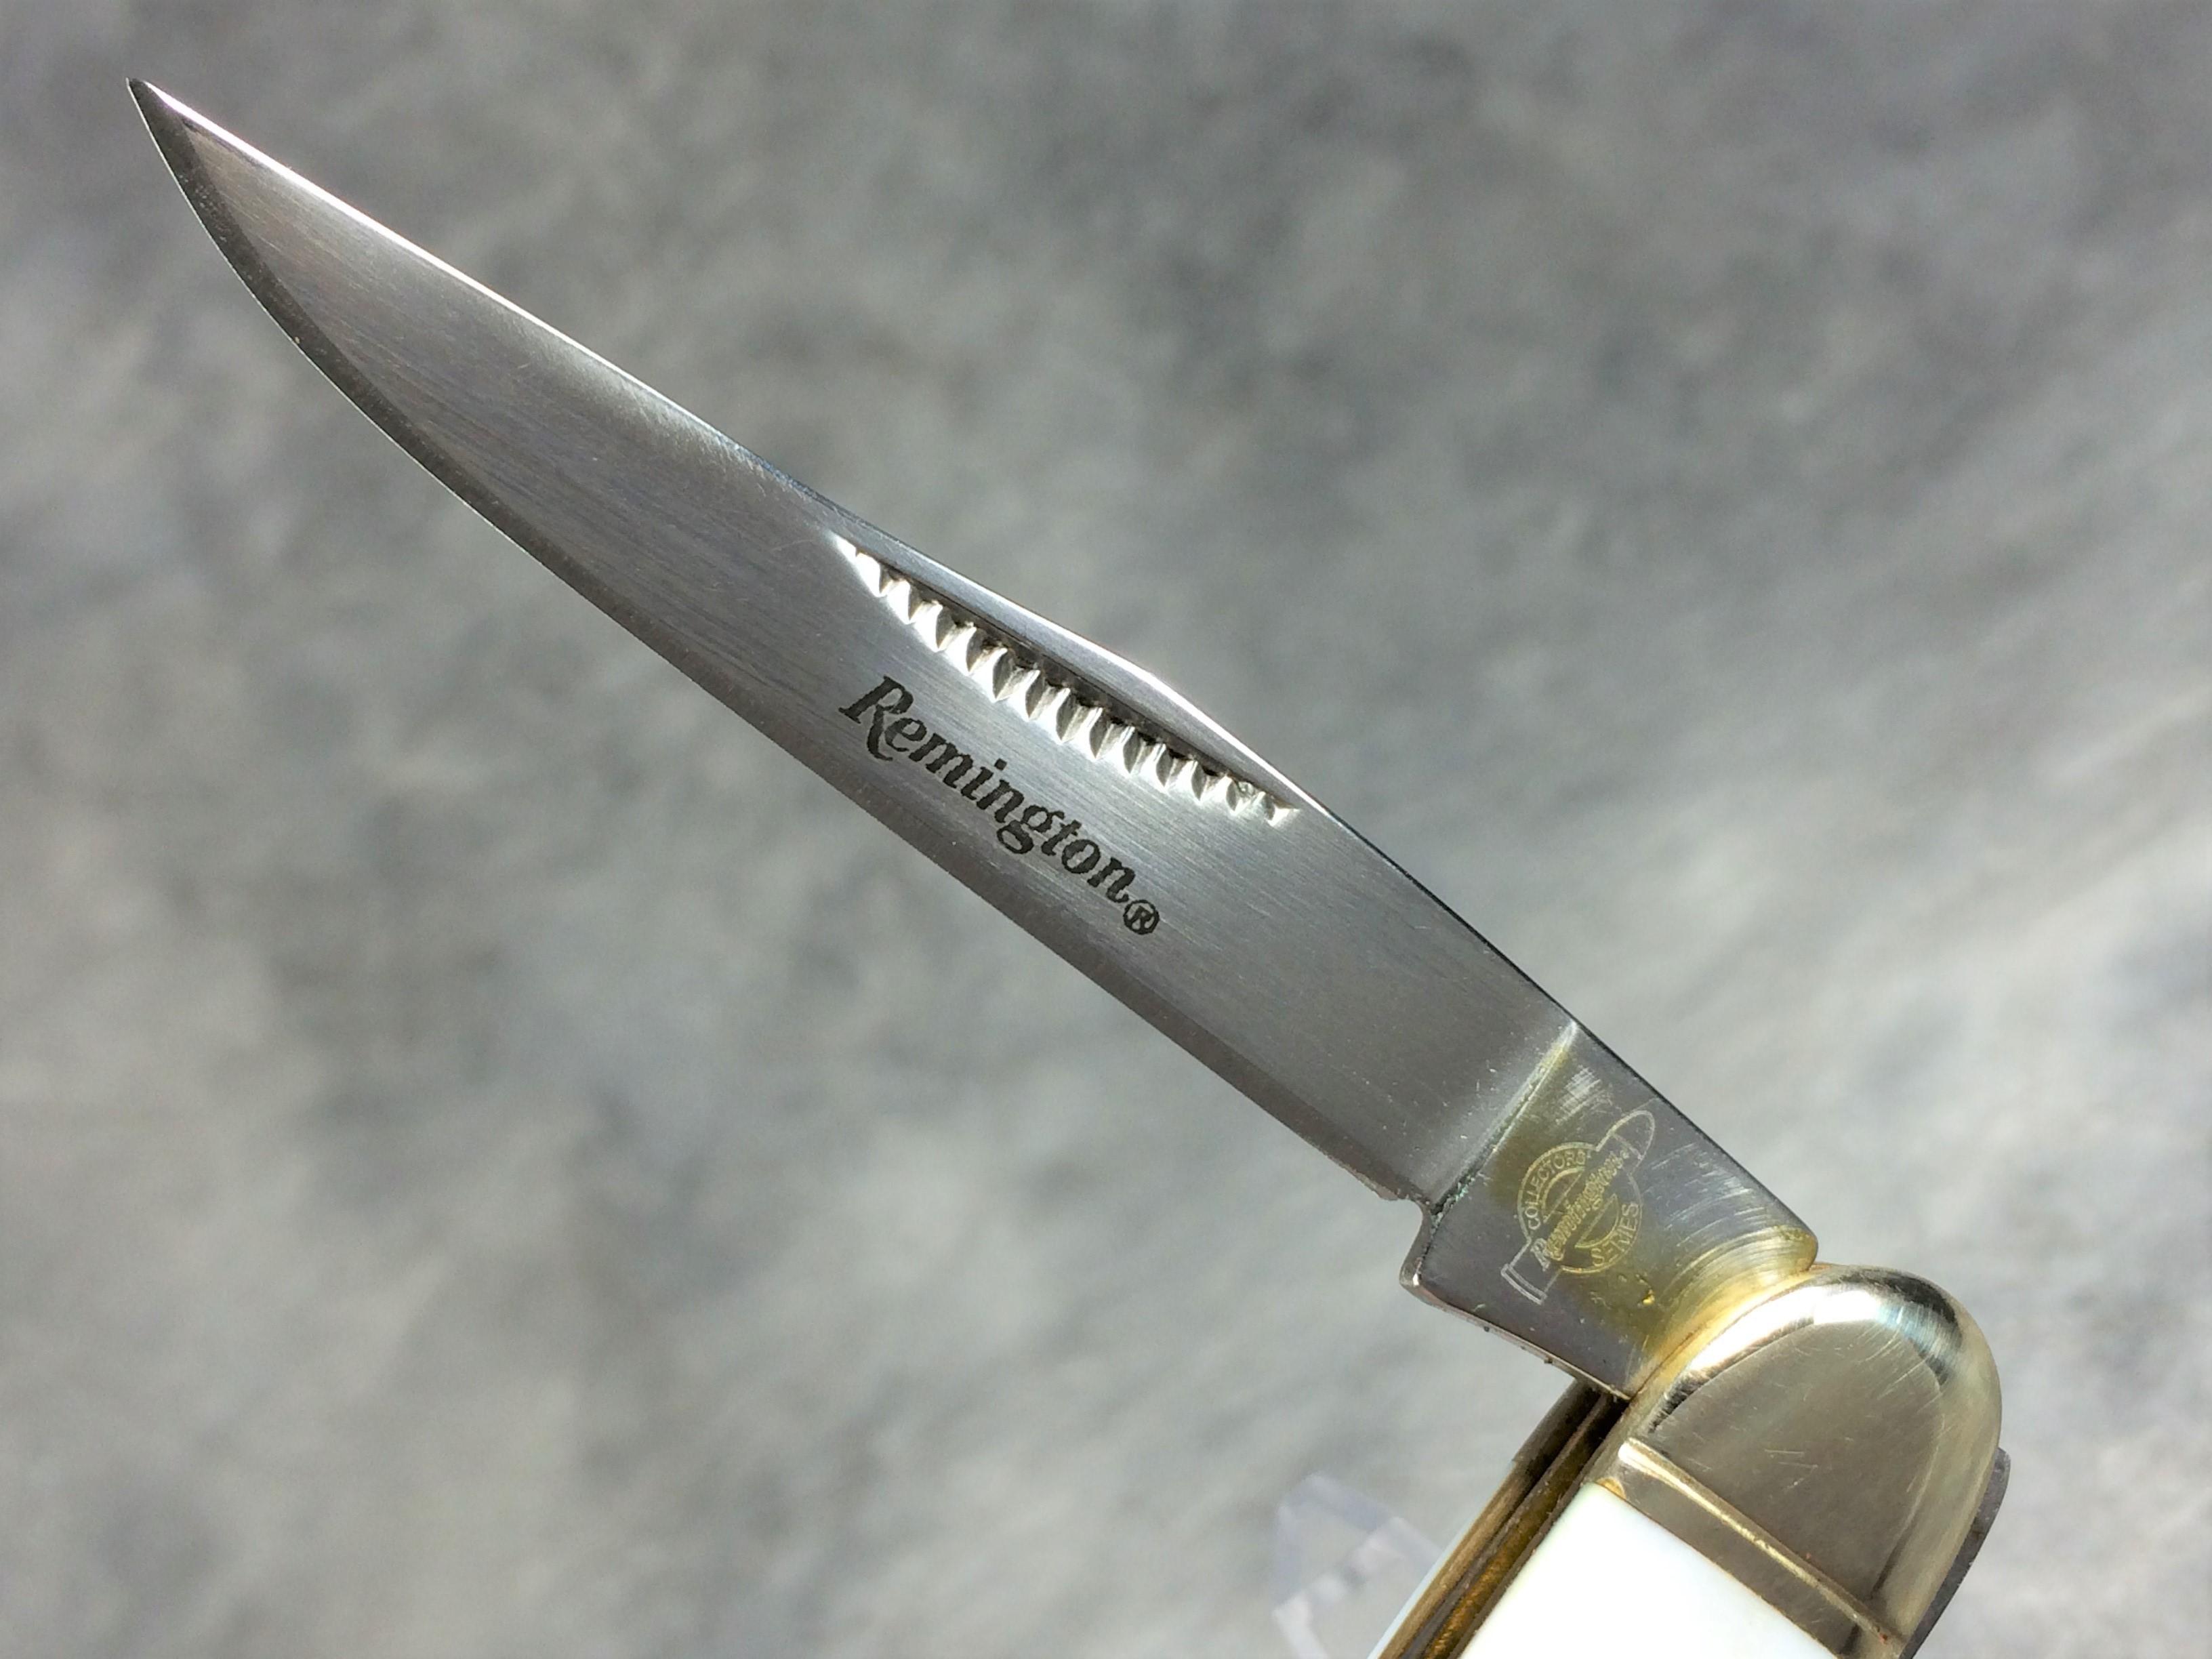 Remington Pocket Knives